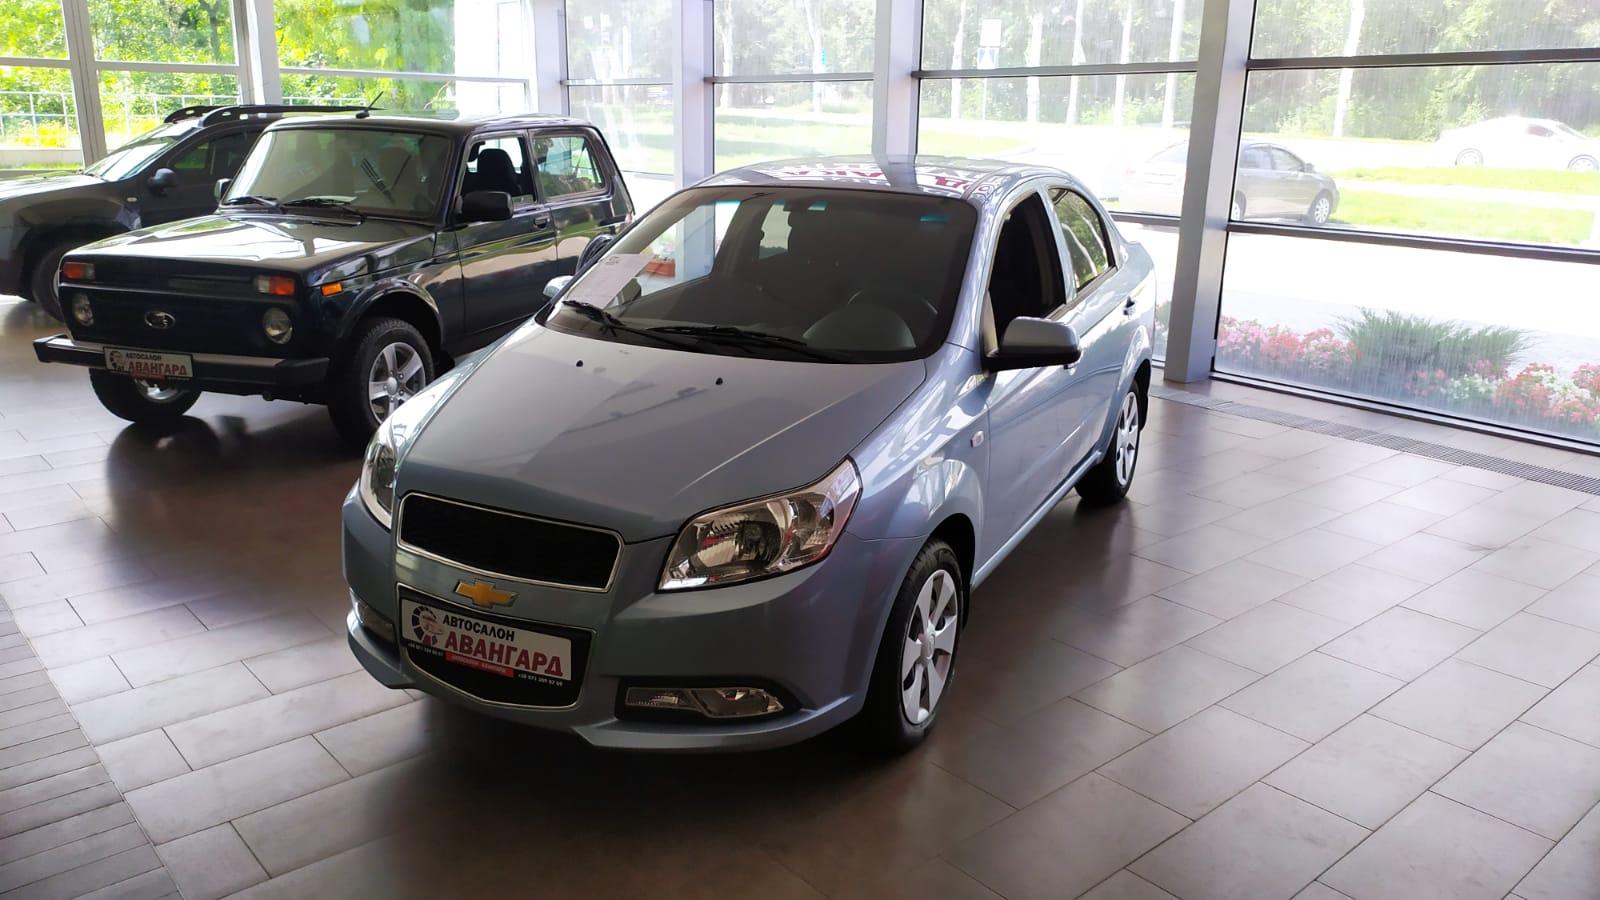 Chevrolet Nexia 1.5 16 кл. (105 л.с.) 6АТ комплектации LT, цвет голубой